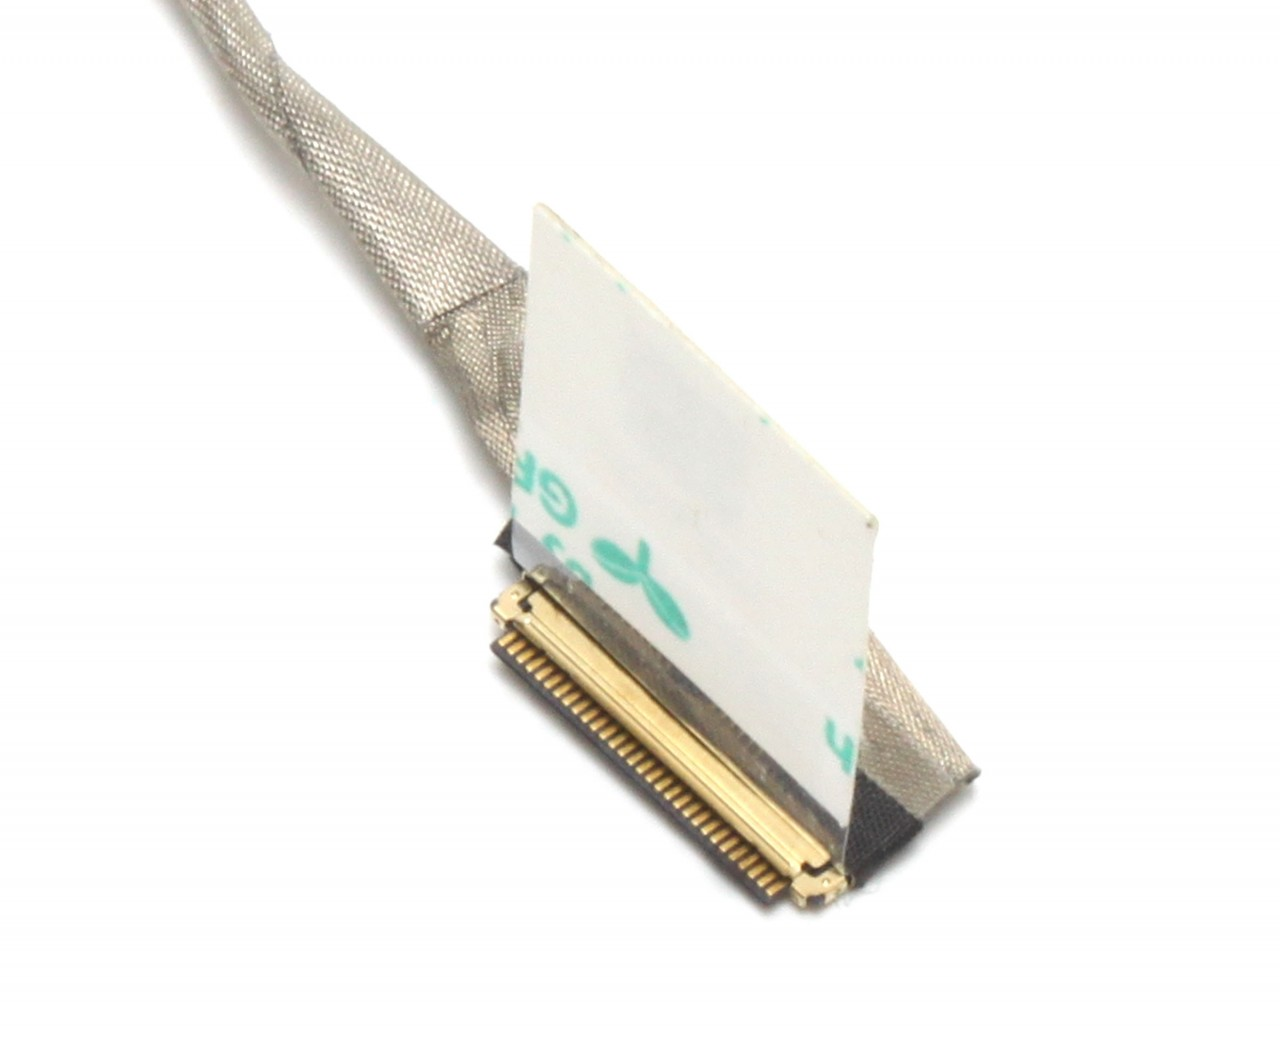 Cablu video LVDS Acer TravelMate P258 MG 30 pini FULL HD 1920x1080 fara touchscreen imagine powerlaptop.ro 2021